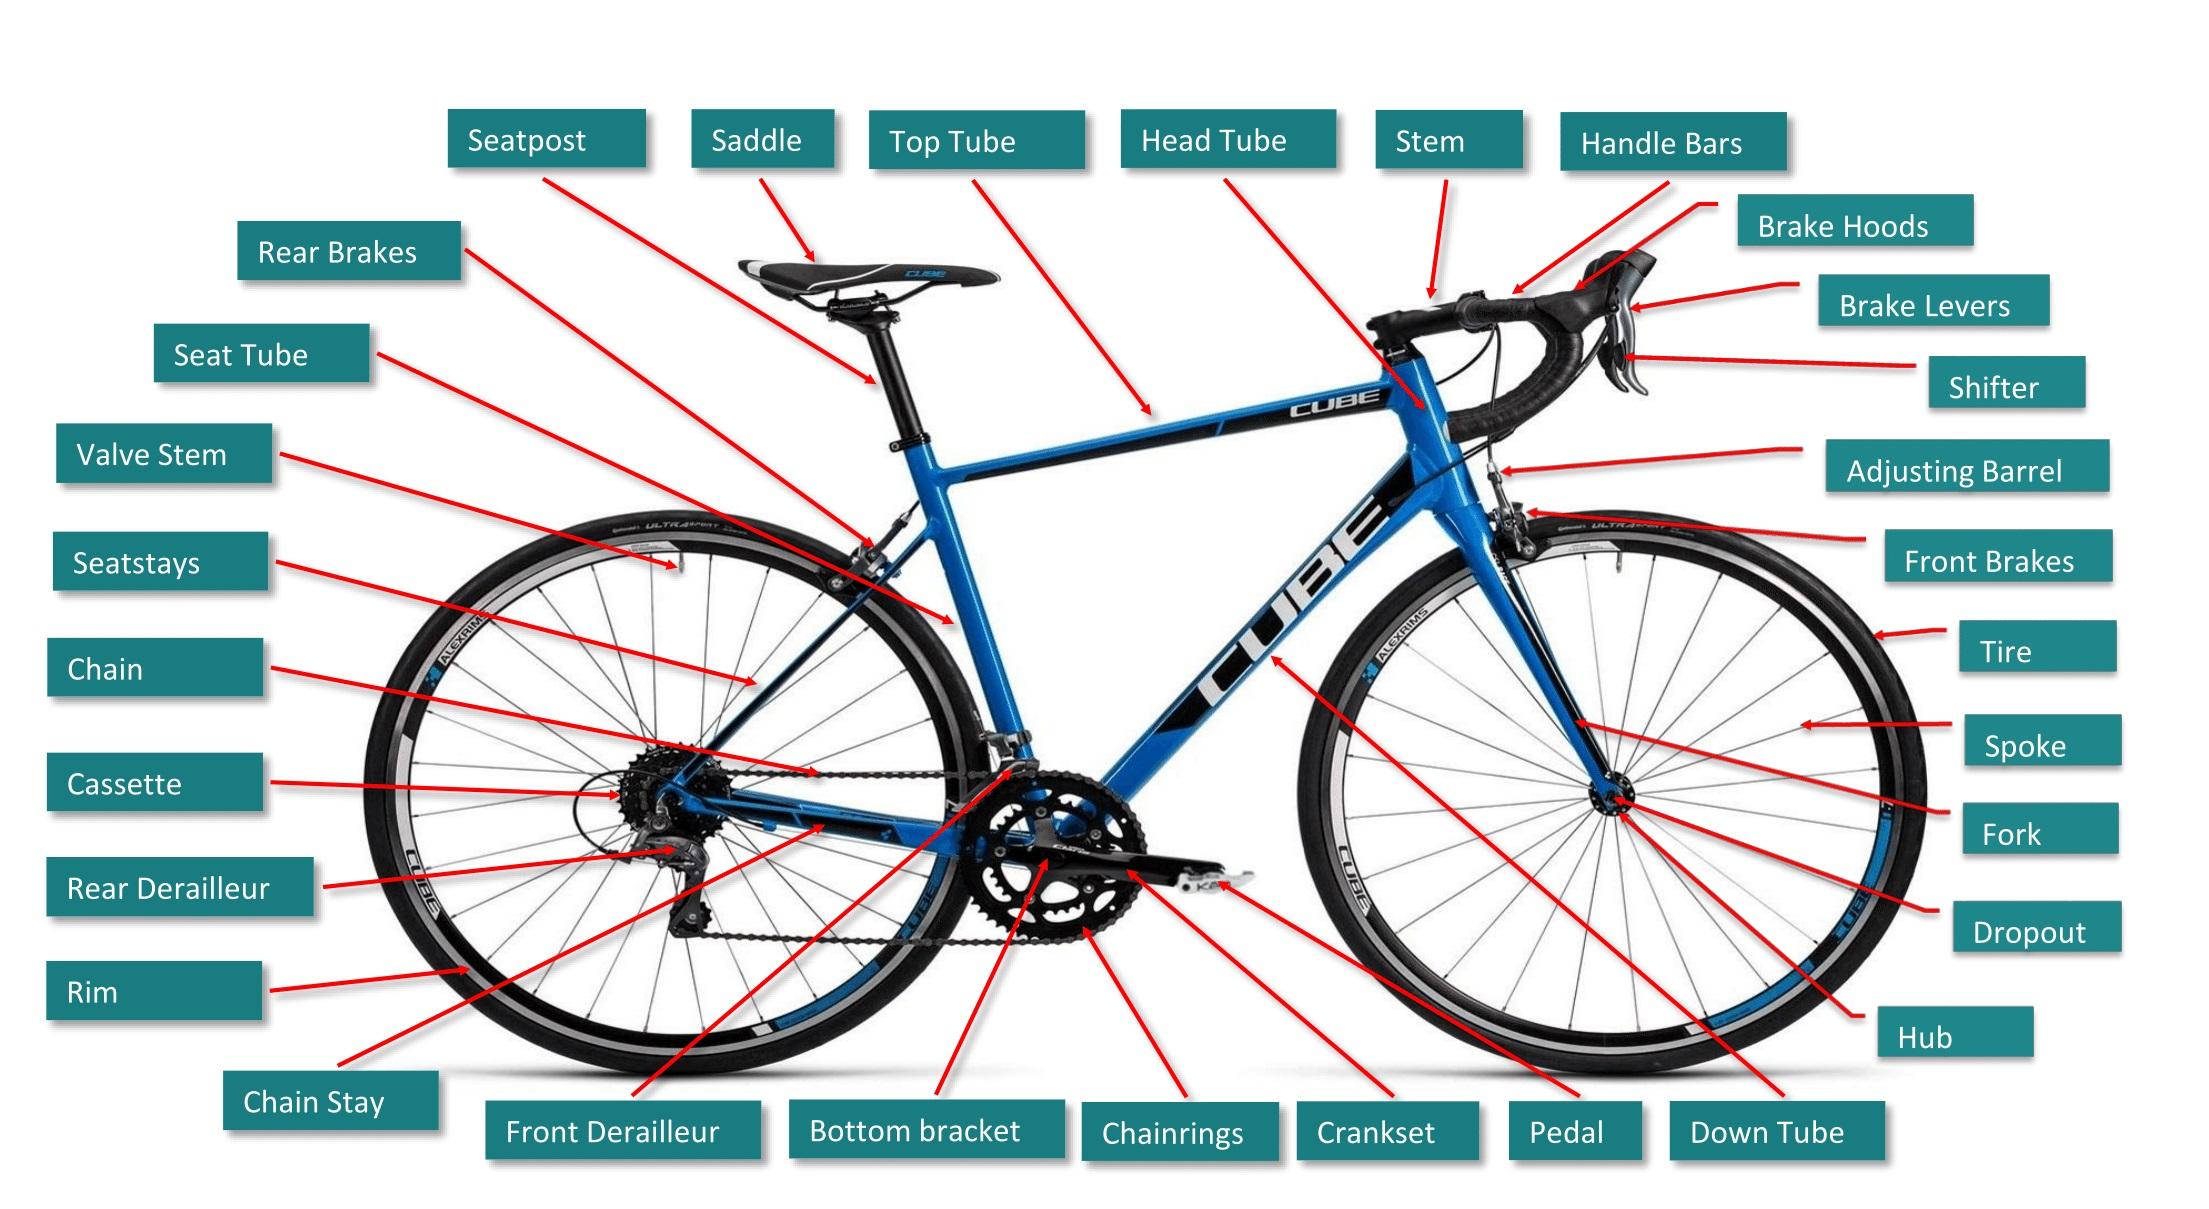 bike parts diagram trailer lights wiring 4 pin bicycle wheel get free image about